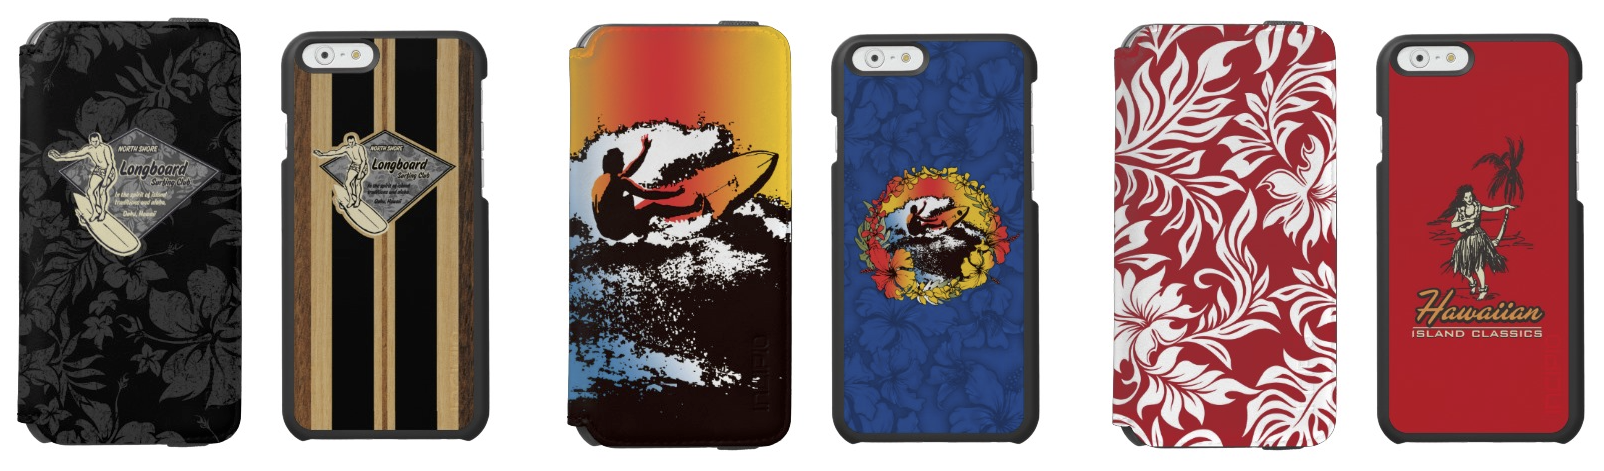 Club Surfing & Waimea, Groovy Hawaiian Surfer and Waikiki Pareau & Hula Girl Duo Cases